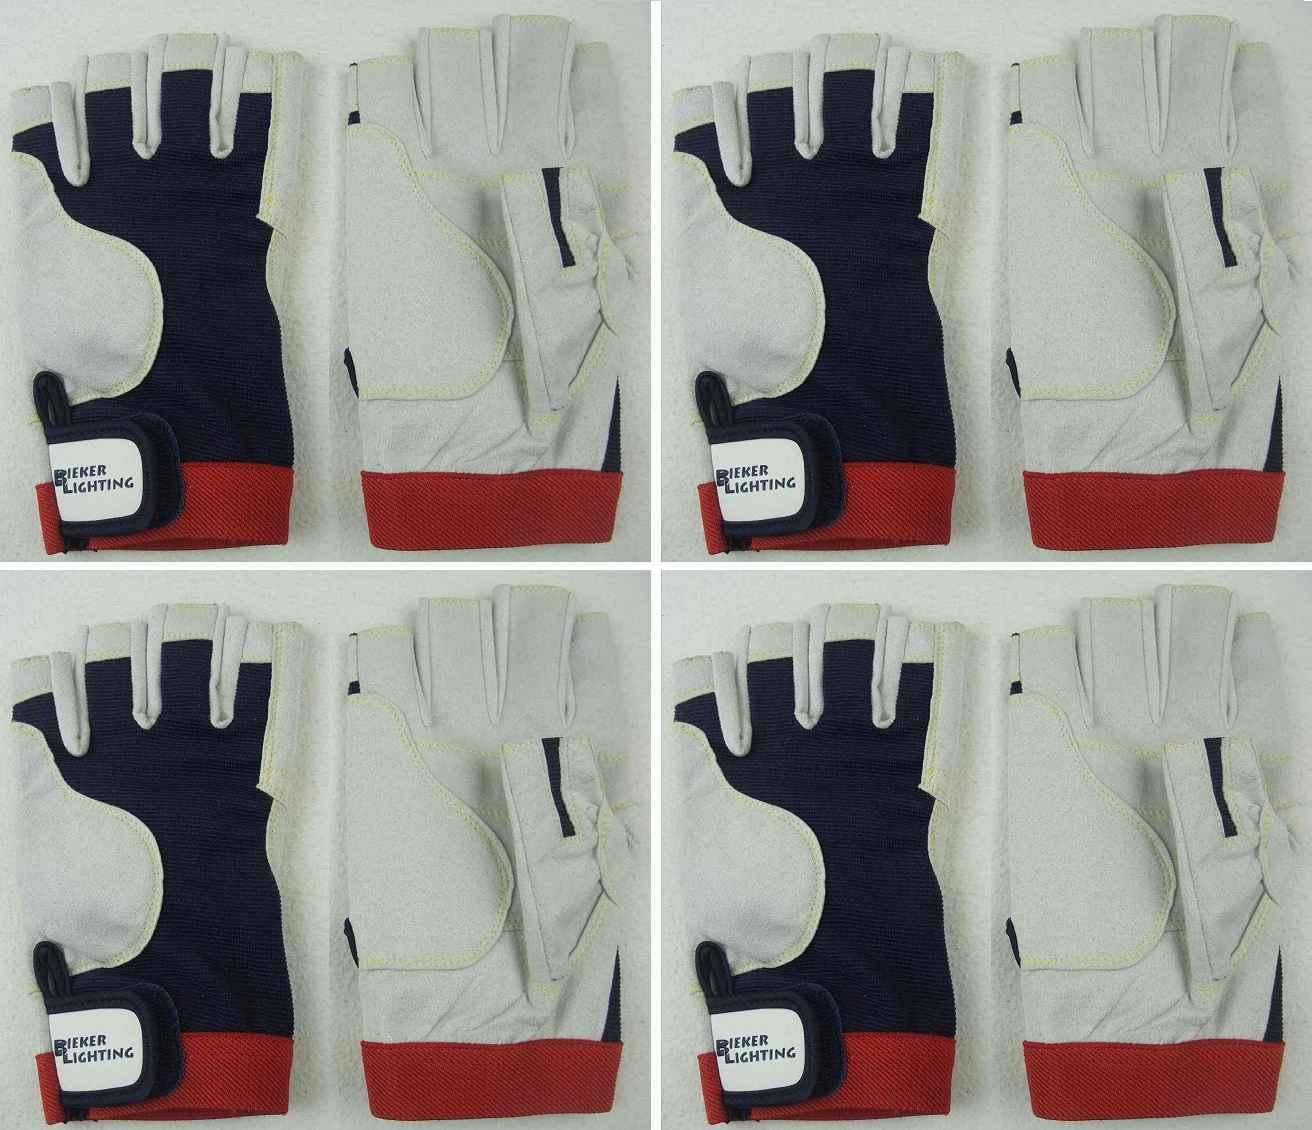 4x AMARA Handschuhe M (8) fingerlos Arbeitshandschuhe Montagehandschuhe Rigger